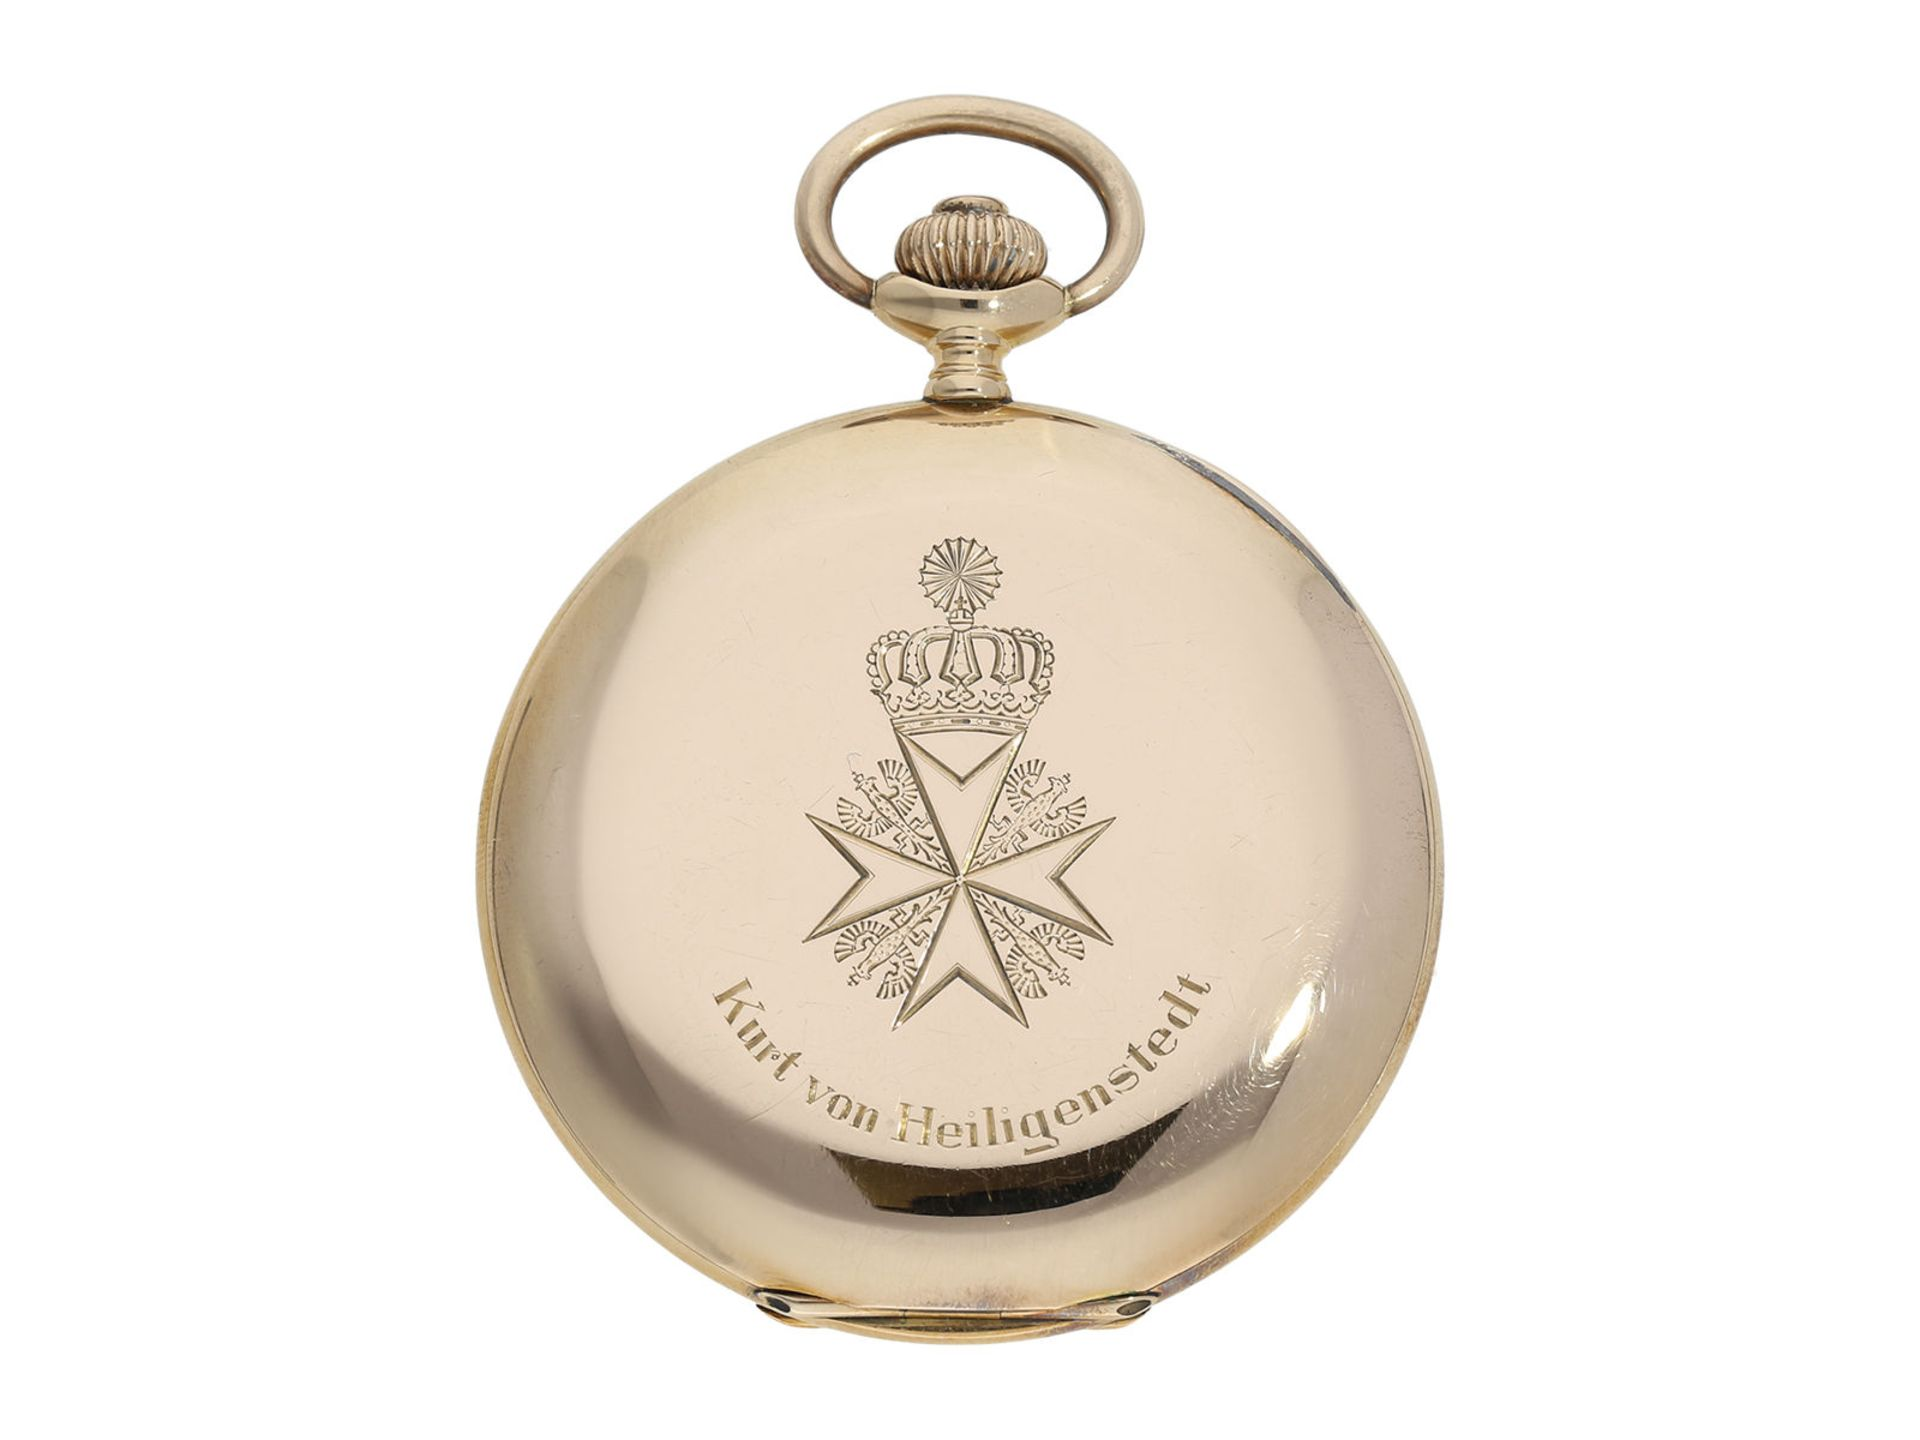 Pocket watch: historically interesting gold hunting case watch from the property of Kurt von - Bild 6 aus 7